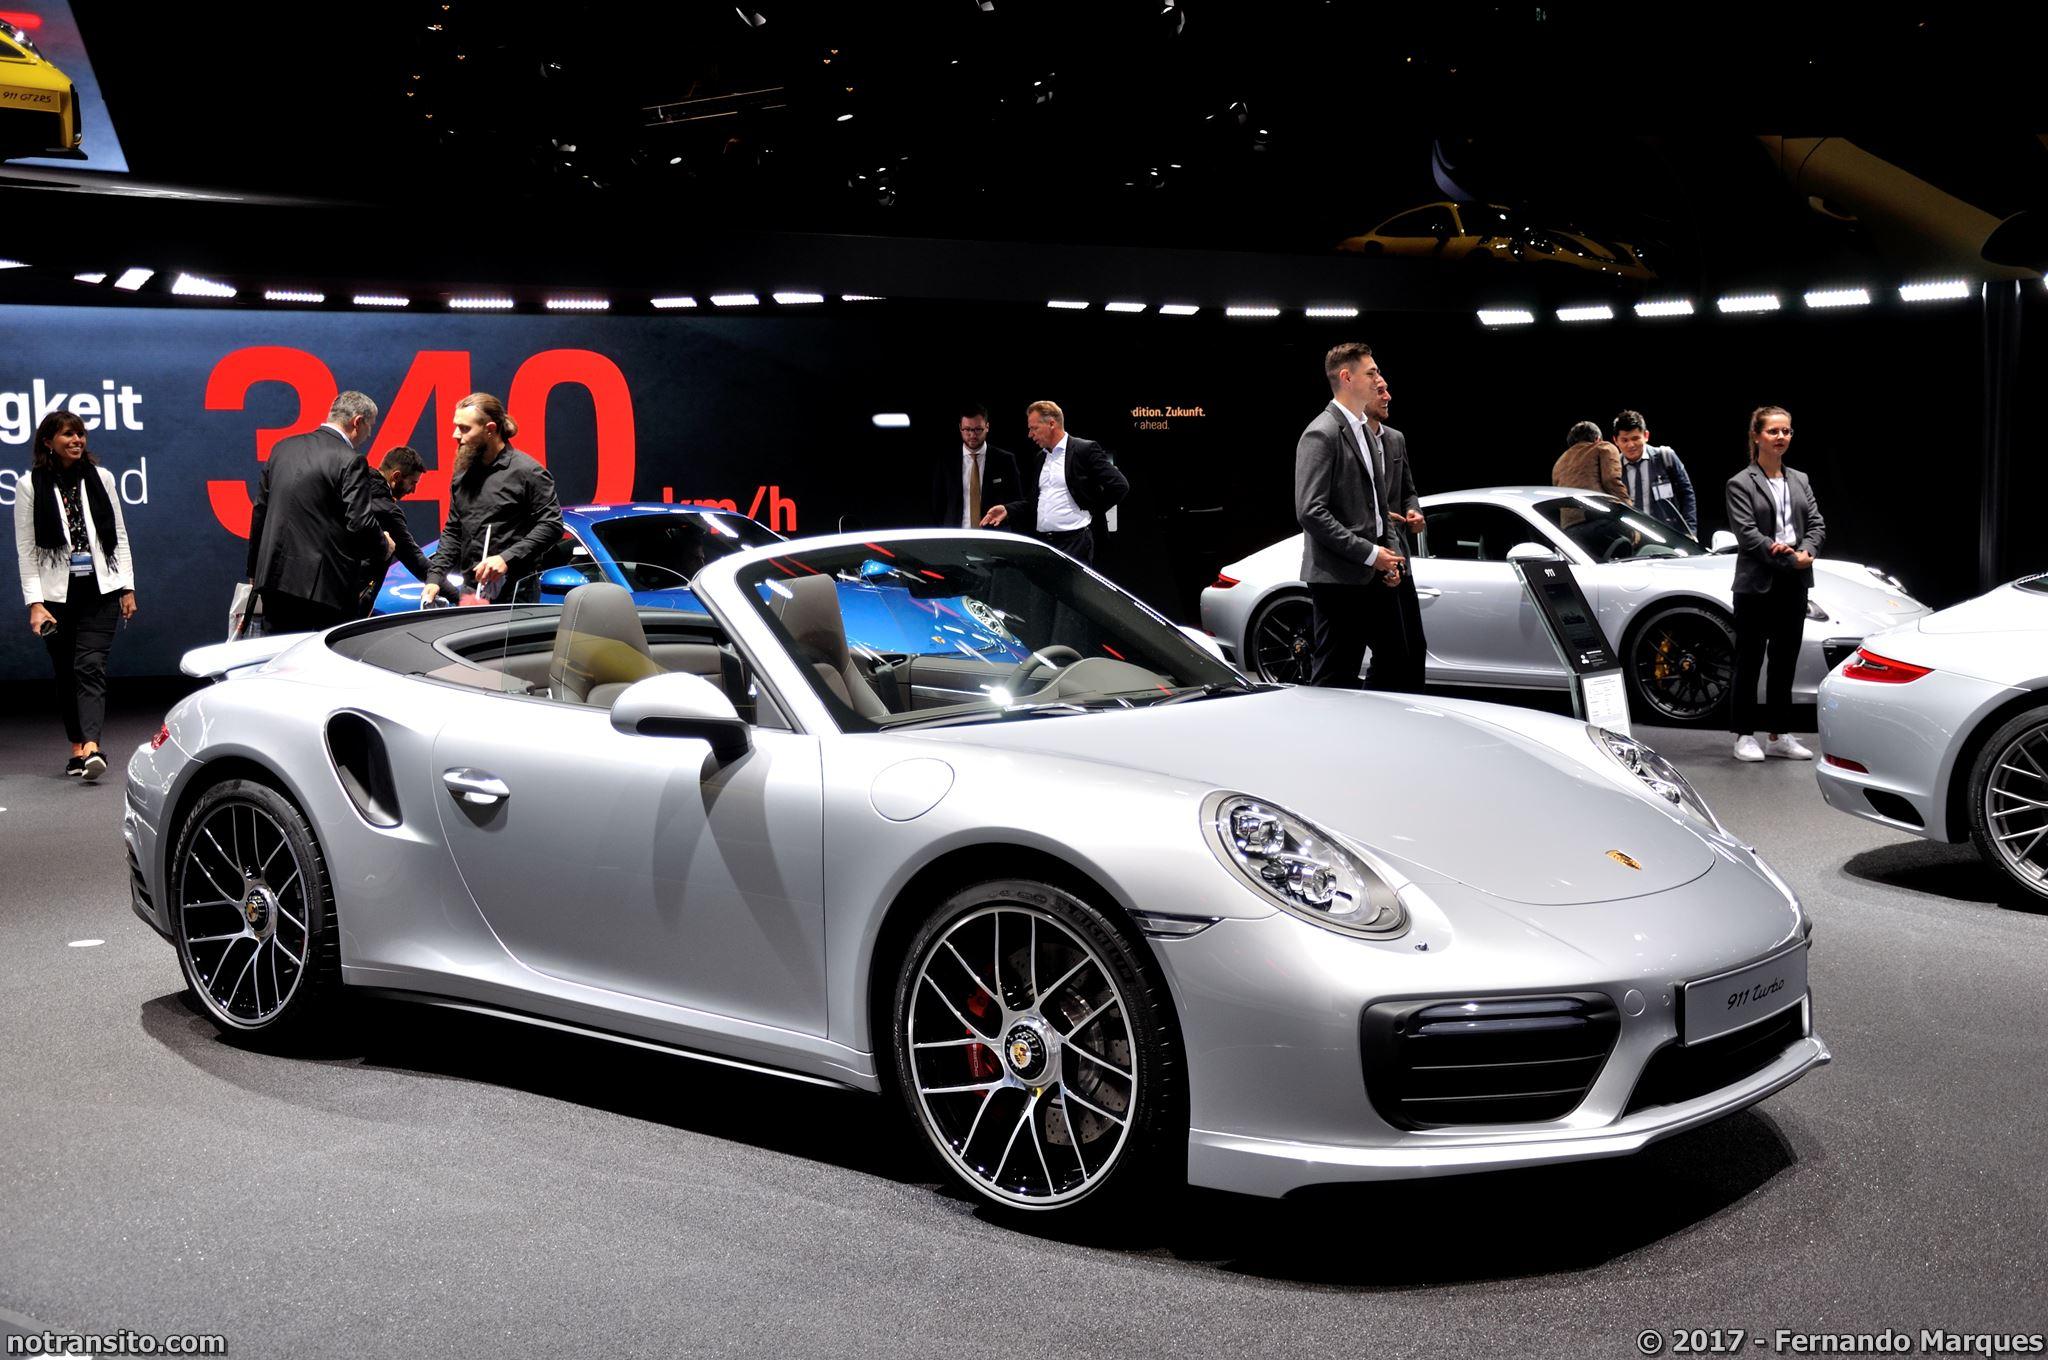 Porsche-911-Turbo-S-Cabriolet-Frankfurt-2017-002